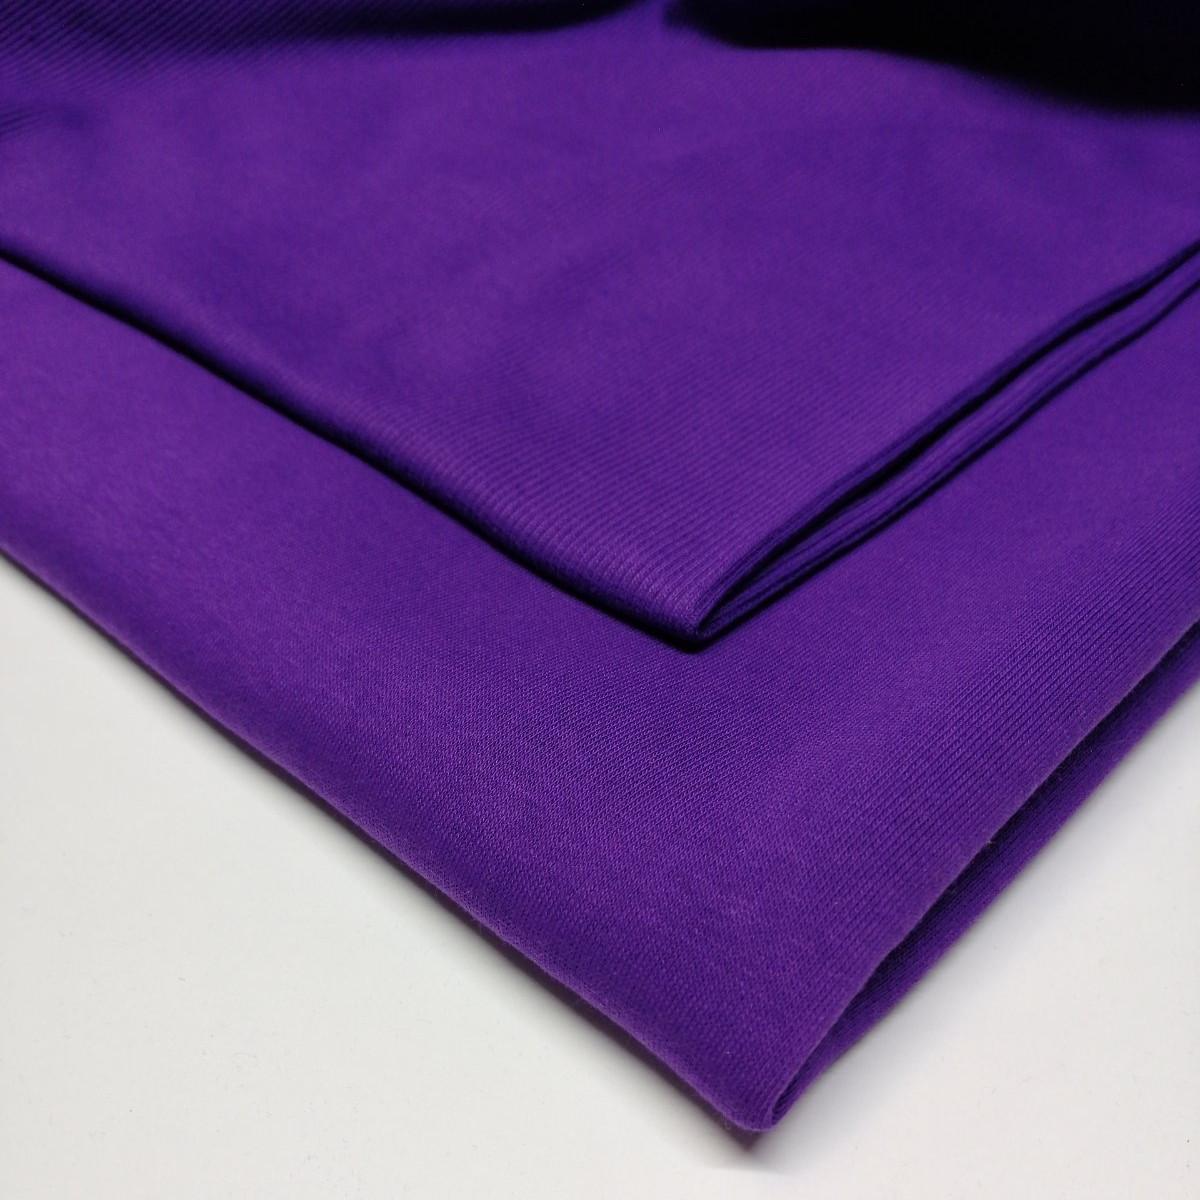 Кашкорсе Темно-фиолетовое для трехнитки (начес).